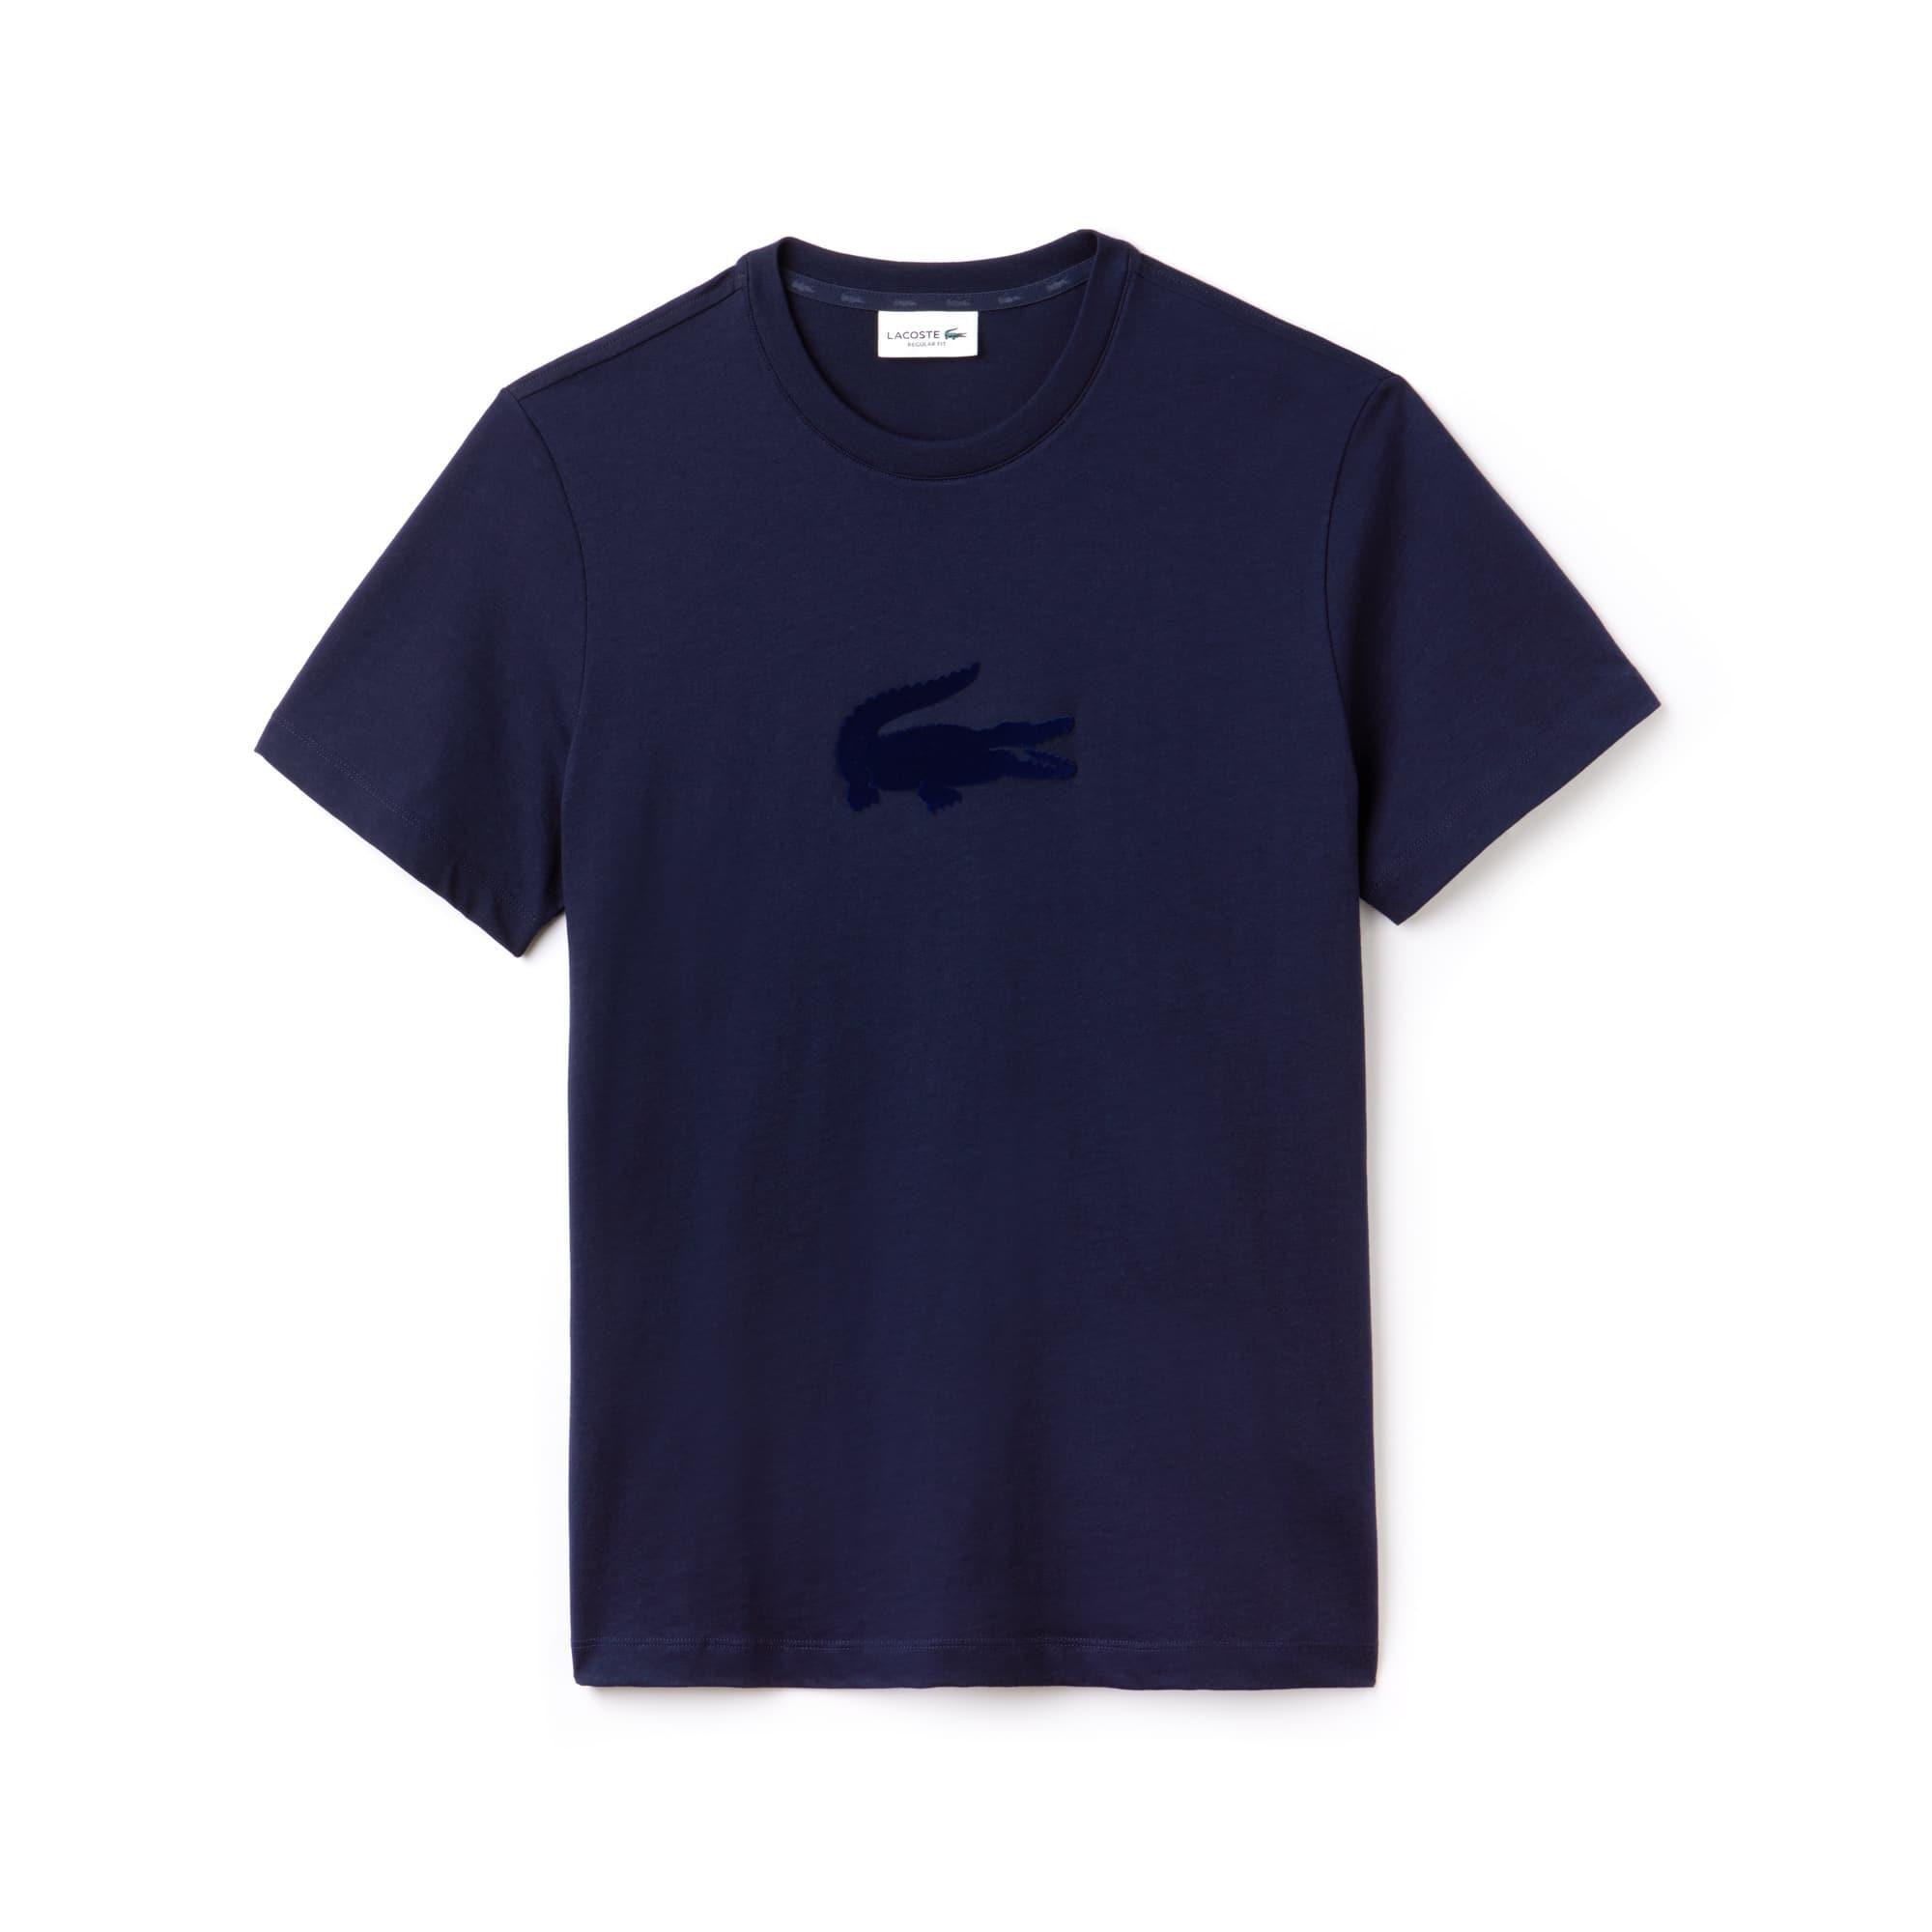 T-shirt heren ronde hals jersey oversized krokodil